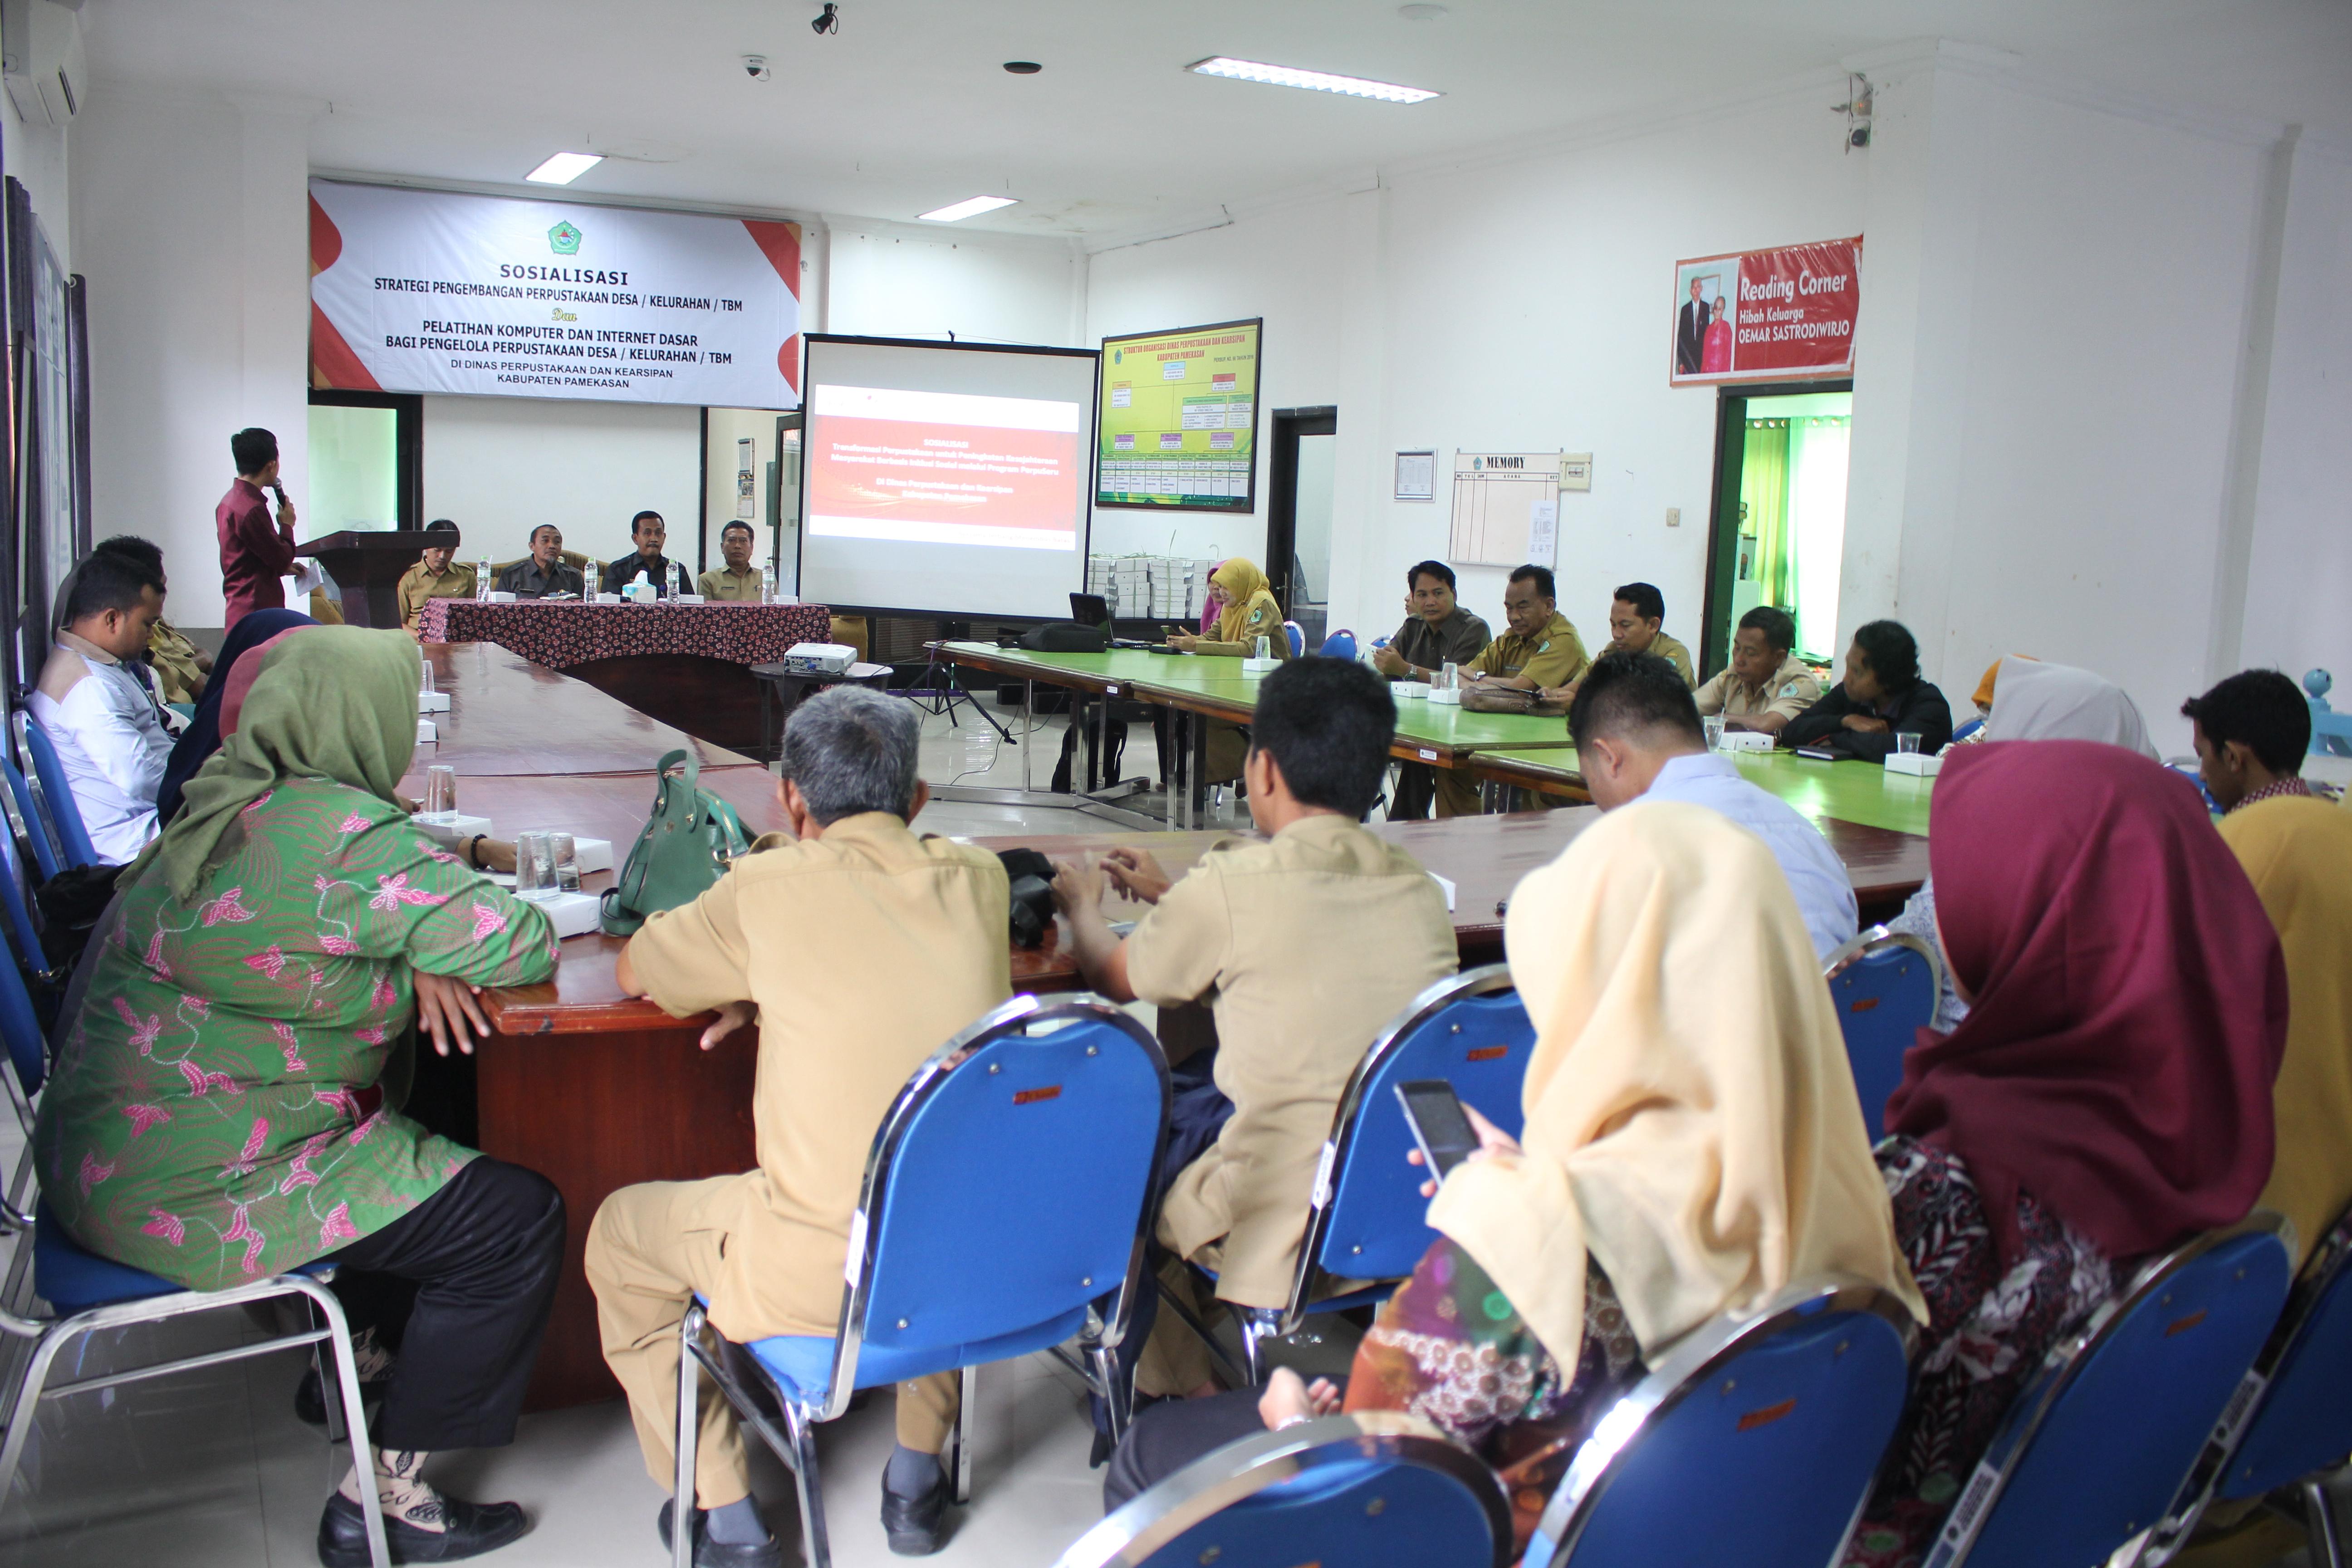 Pelatihan Strategi Pengembangan Perpustakaan berbasis IT bagi Perpustakaan Kelurahan/Desa dan TBM tahun 2018